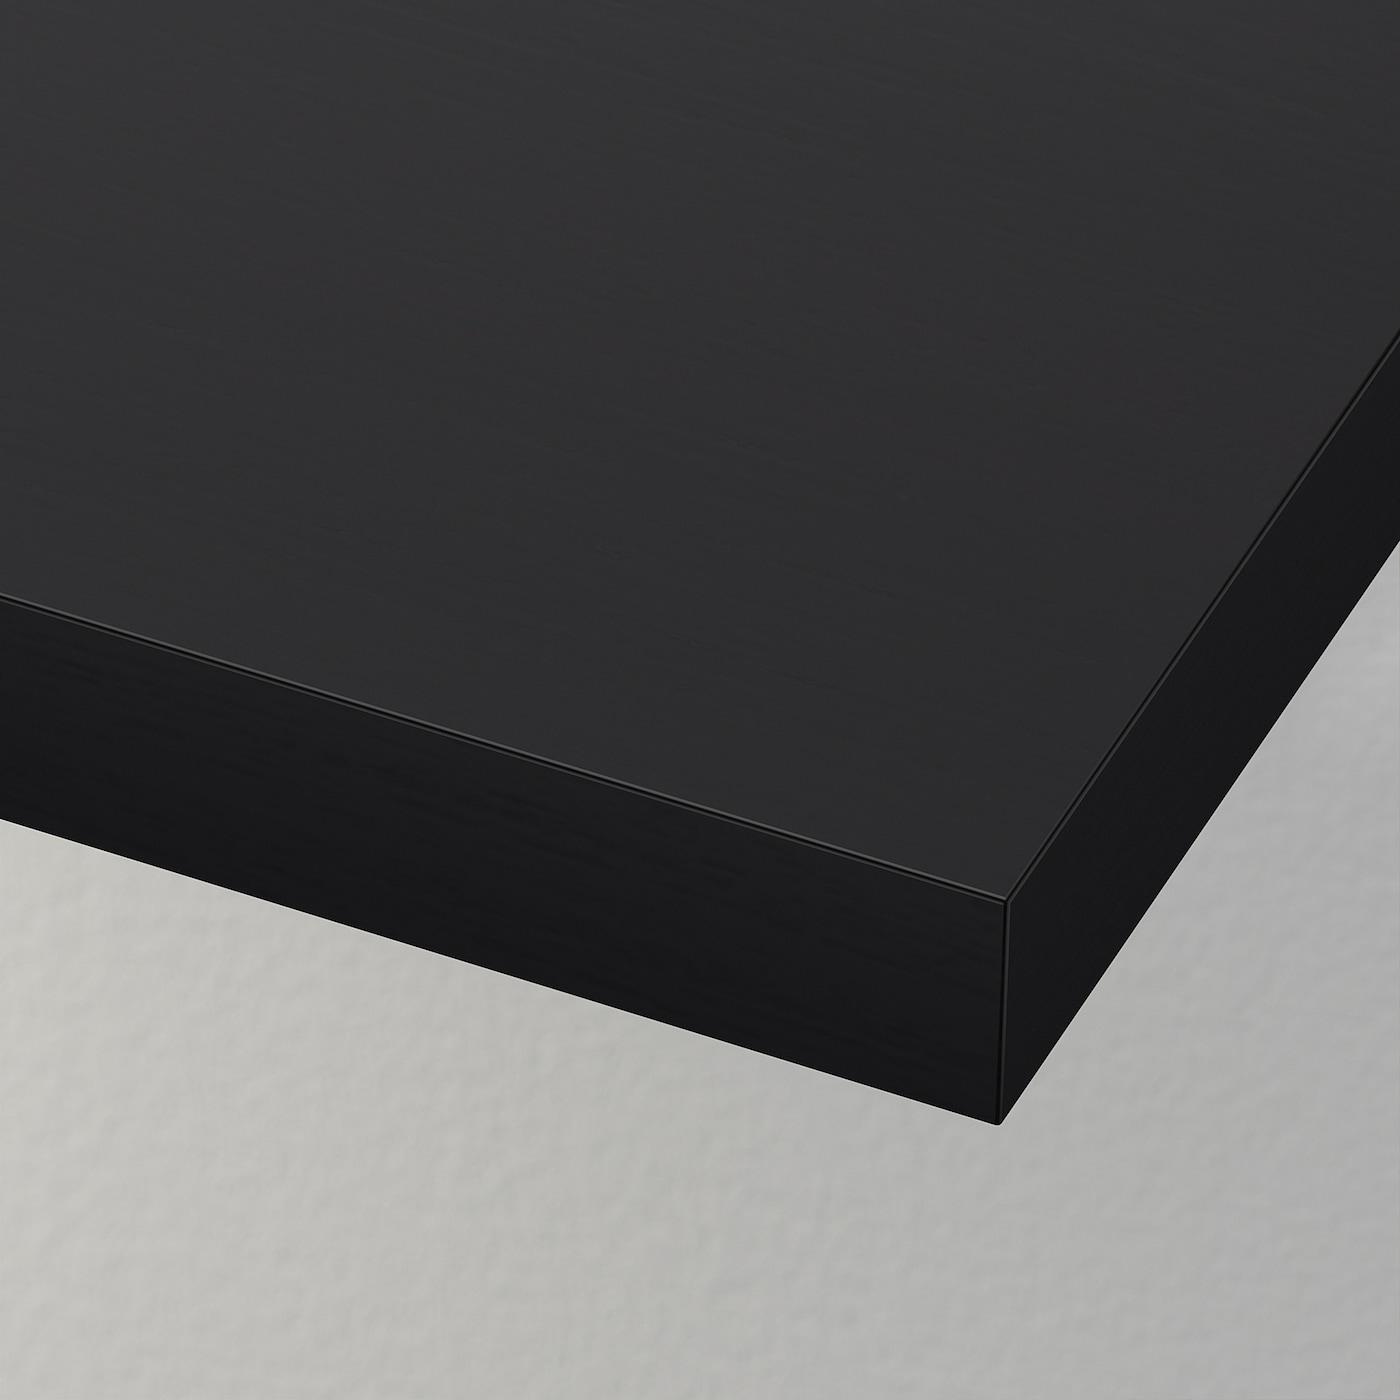 LACK Wall Shelf Black-brown 190 X 26 Cm